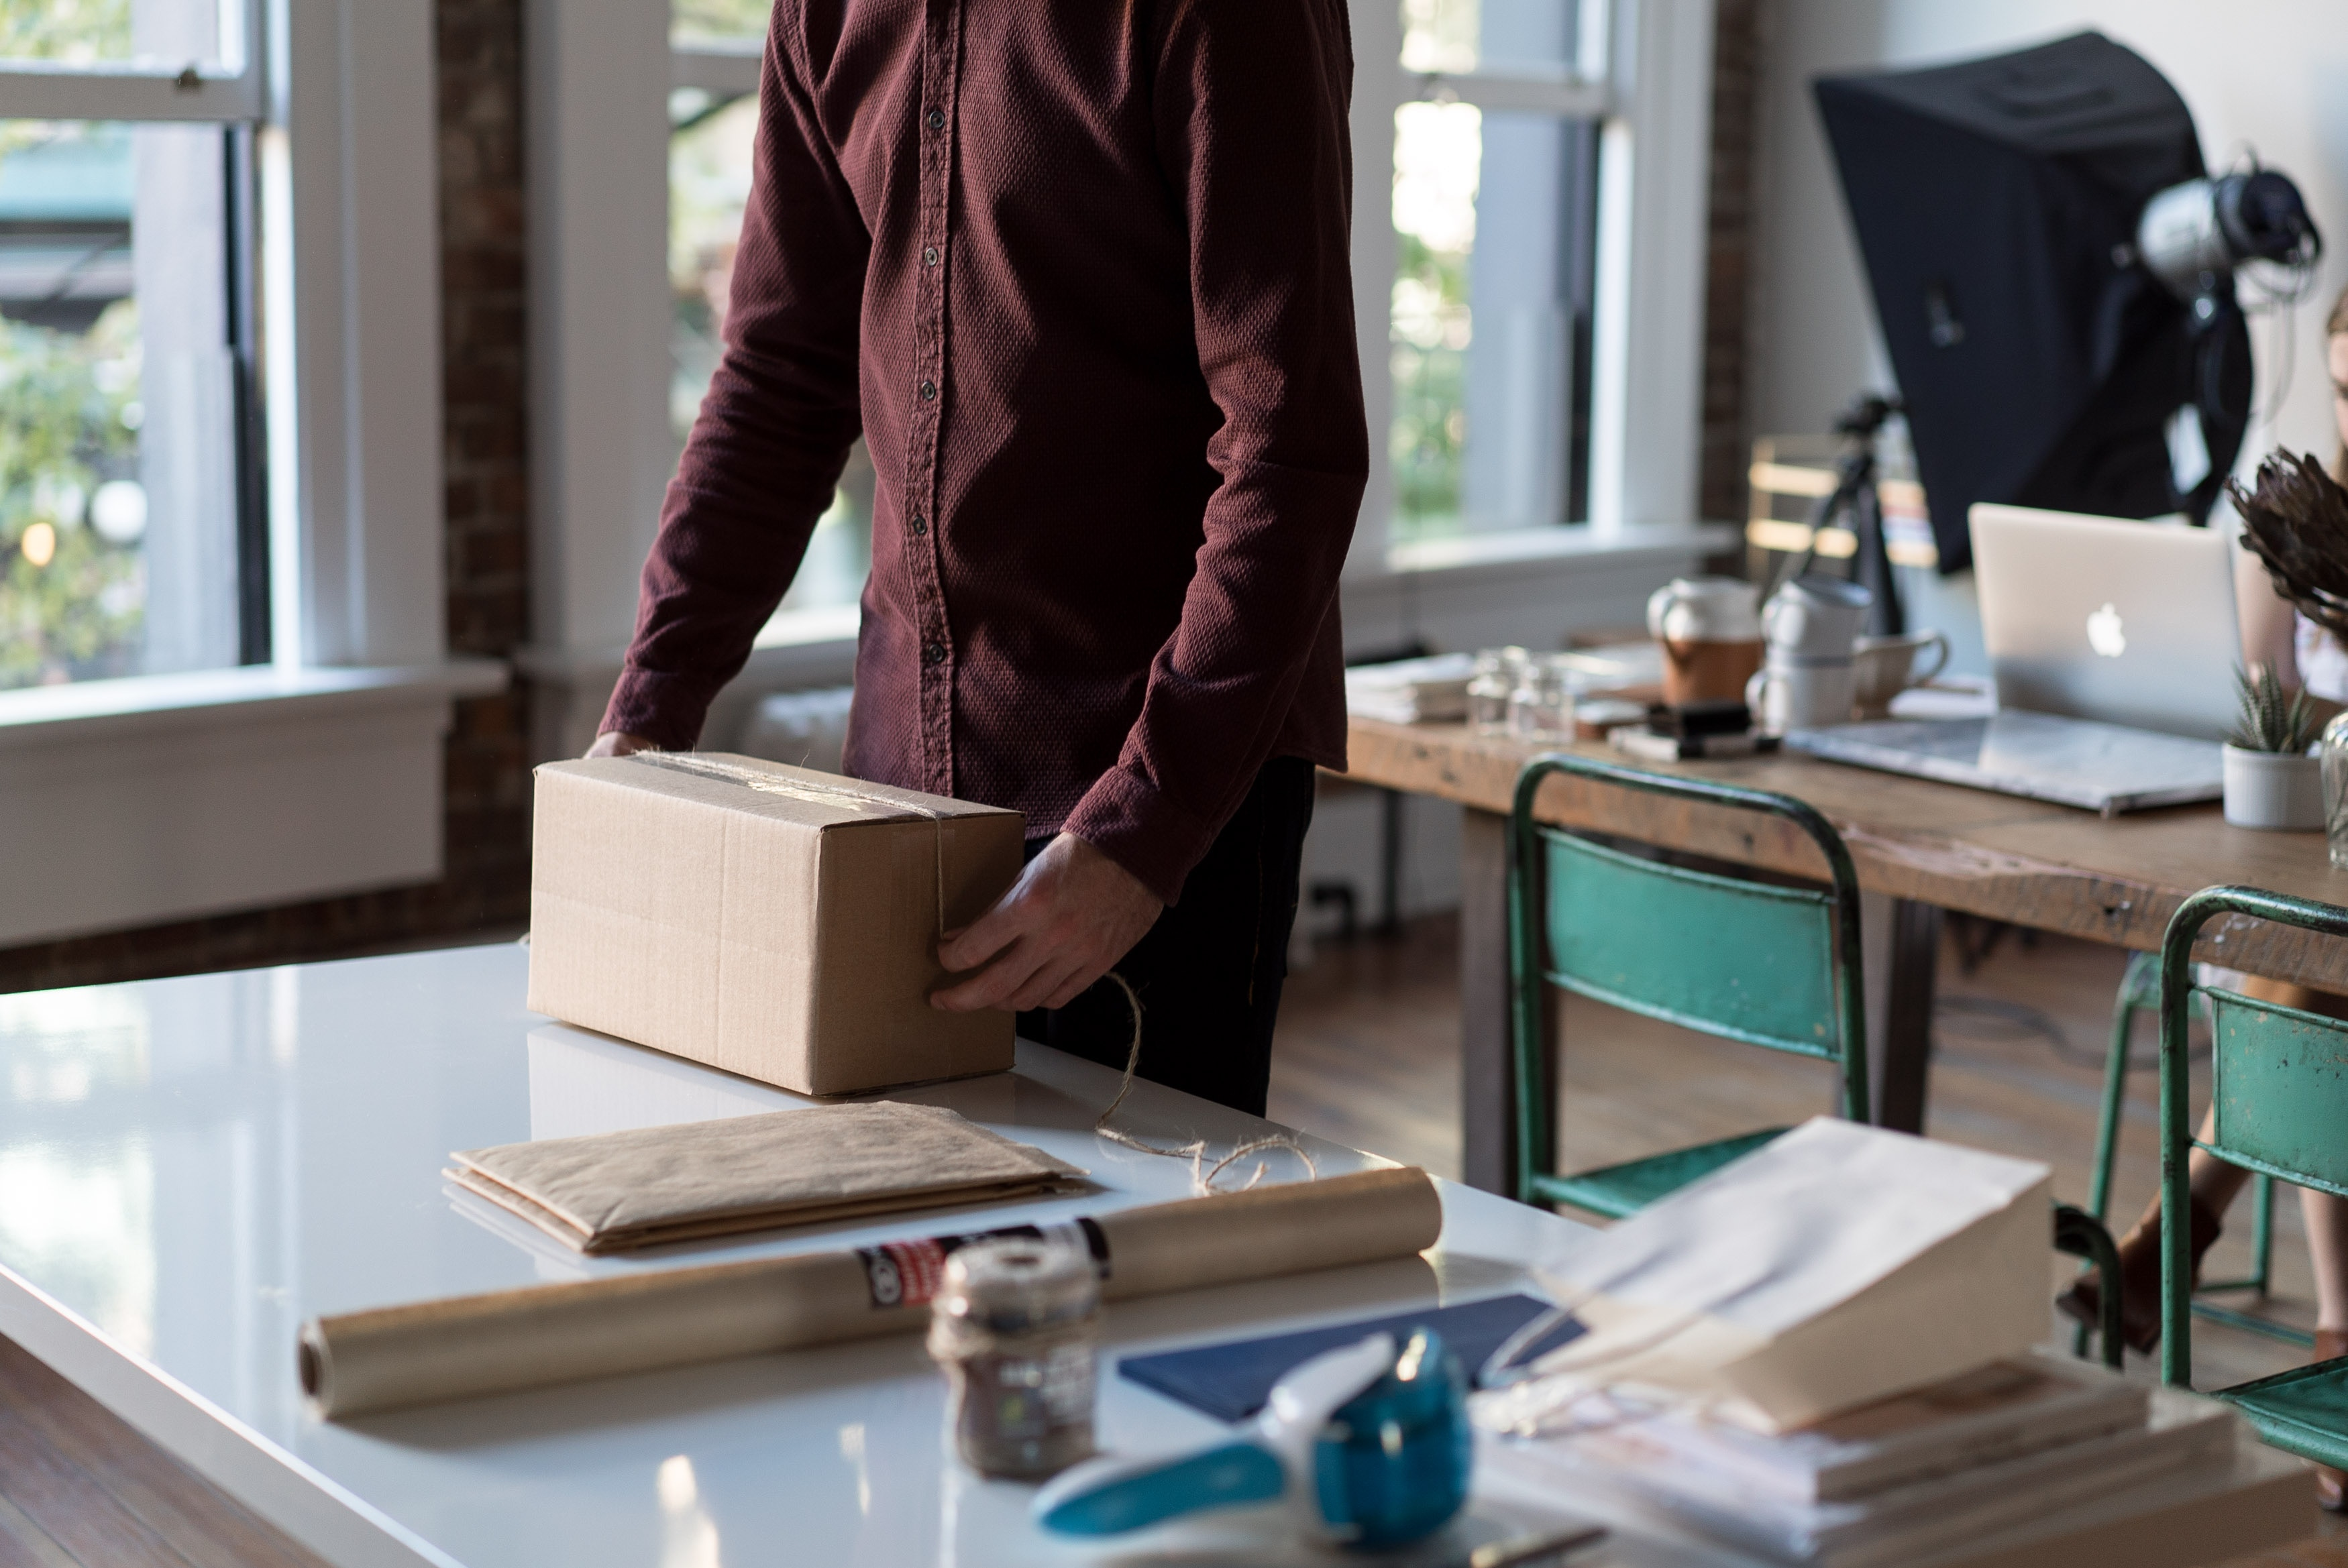 The Inside Scoop: How to Navigate an Internal Job Move